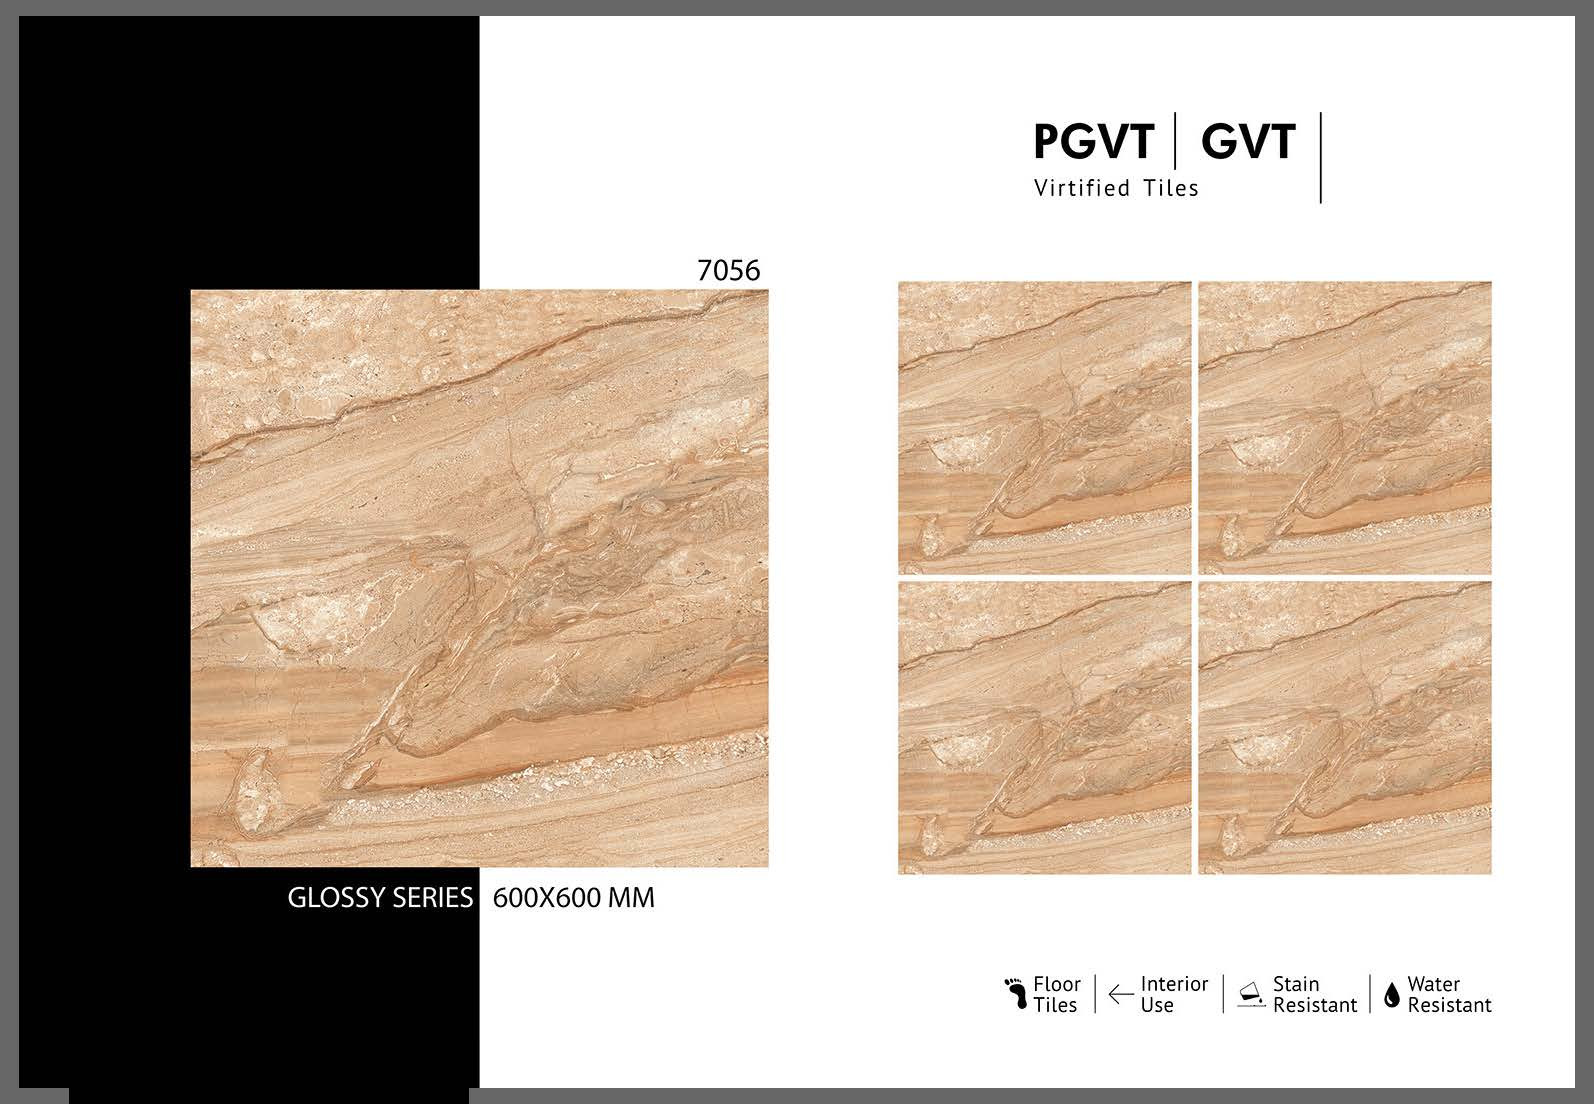 GVT 2X2 GLOSSY_Page_43.jpg